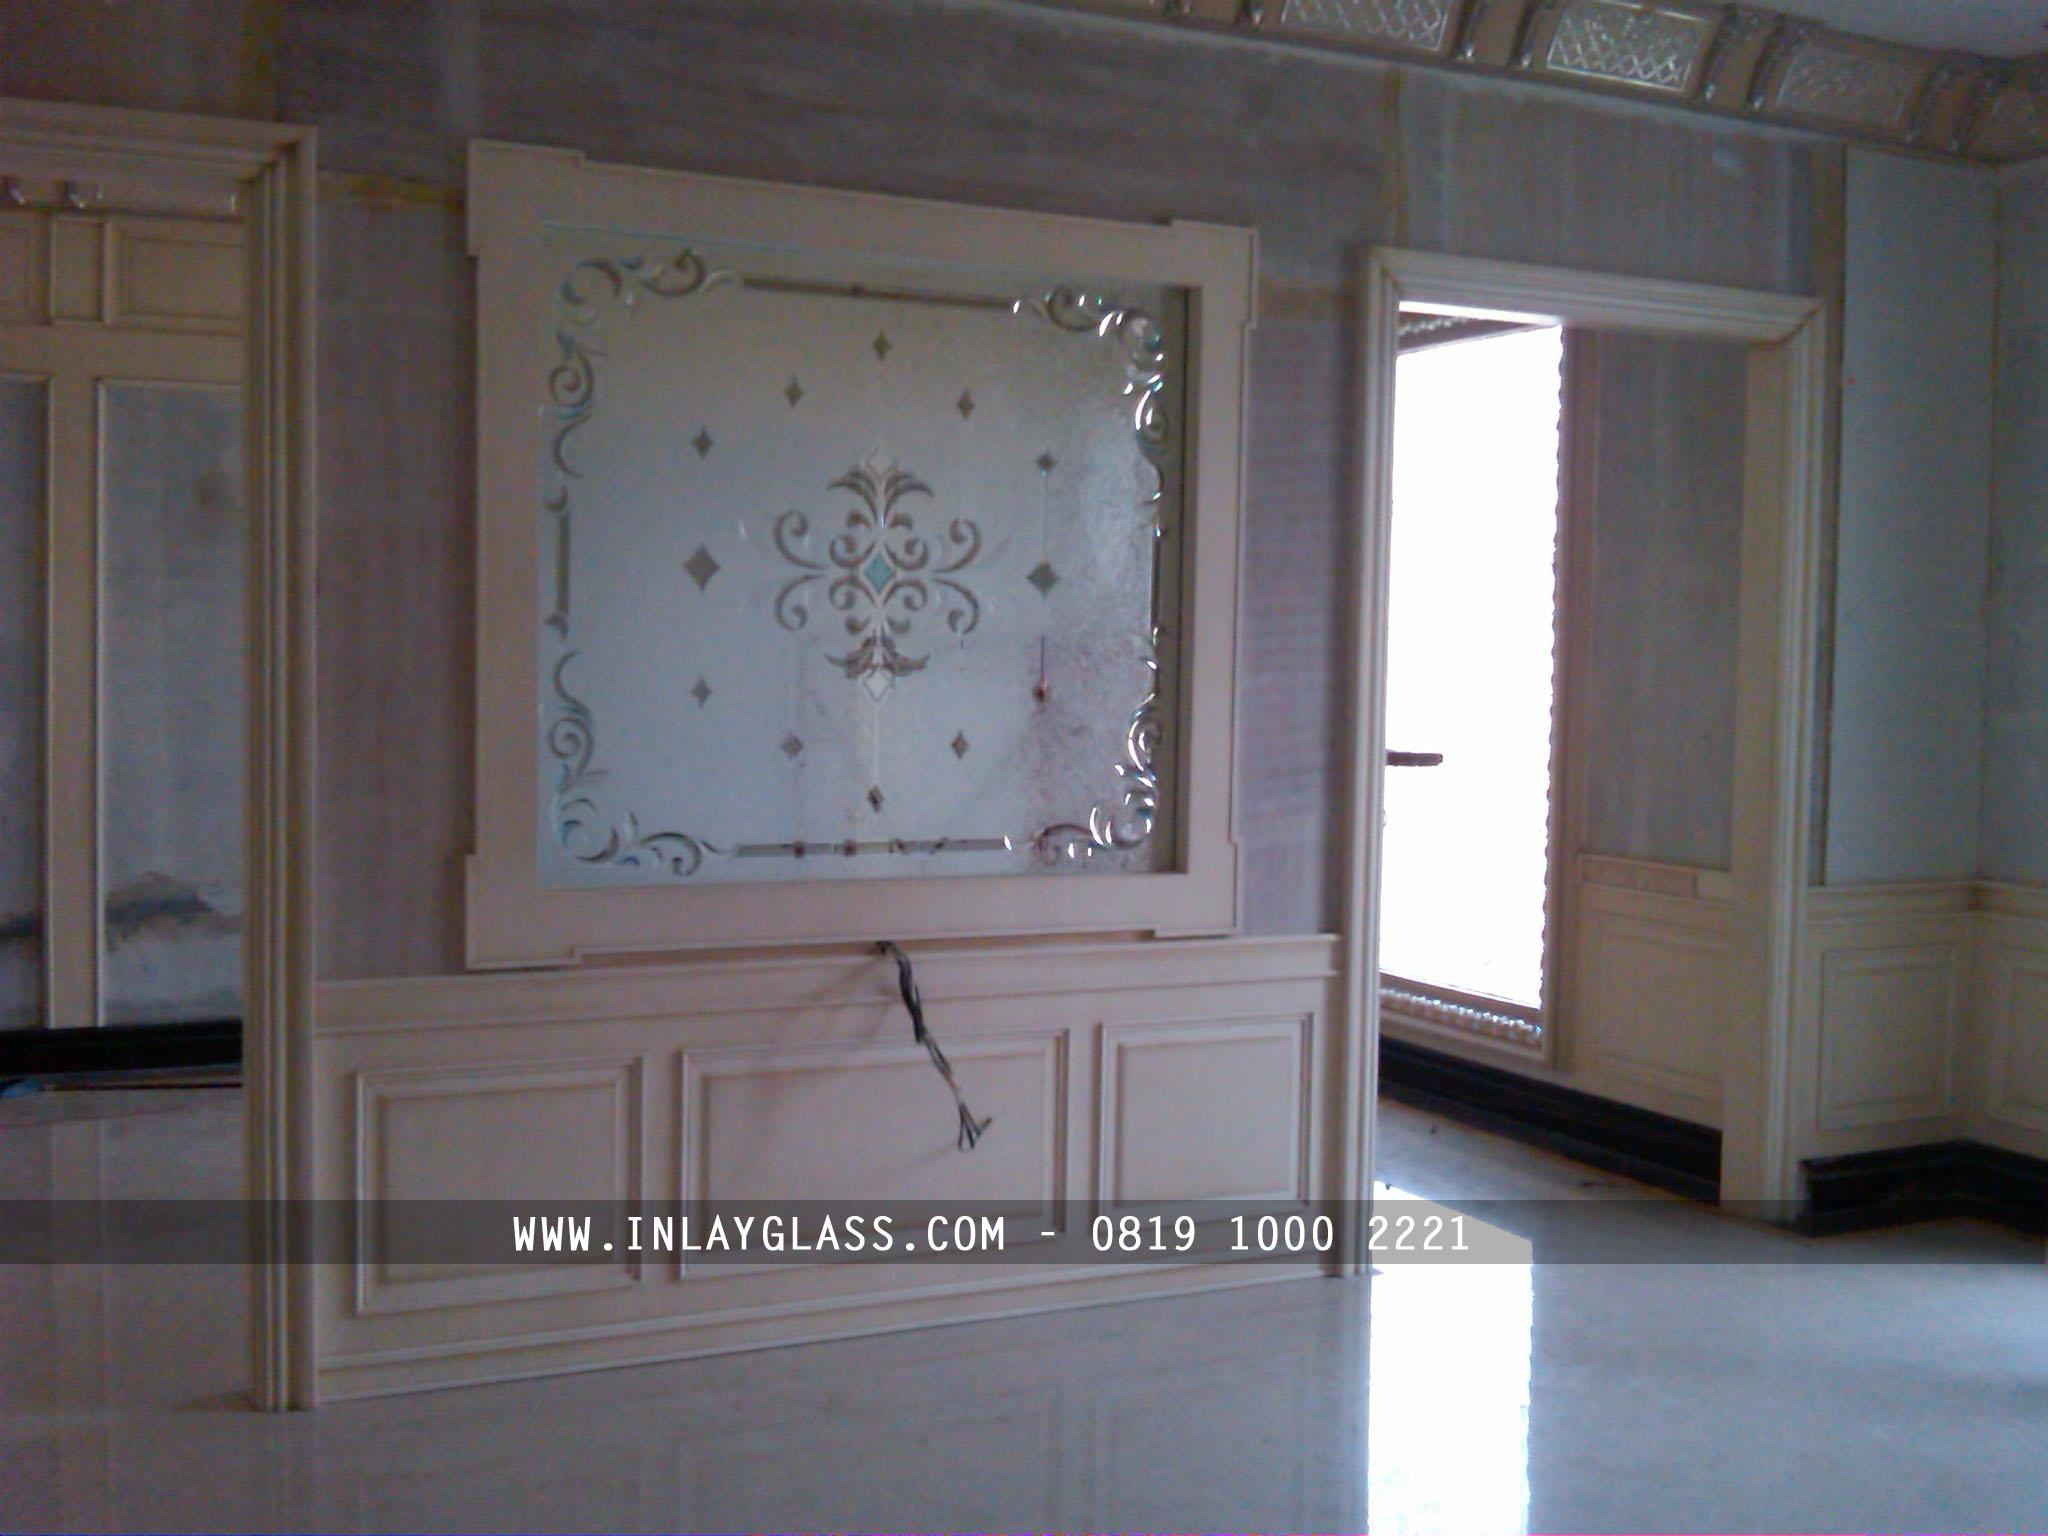 Desain Interior Elegan Dengan Penyekat Ruangan Berbahan Kaca Inlay